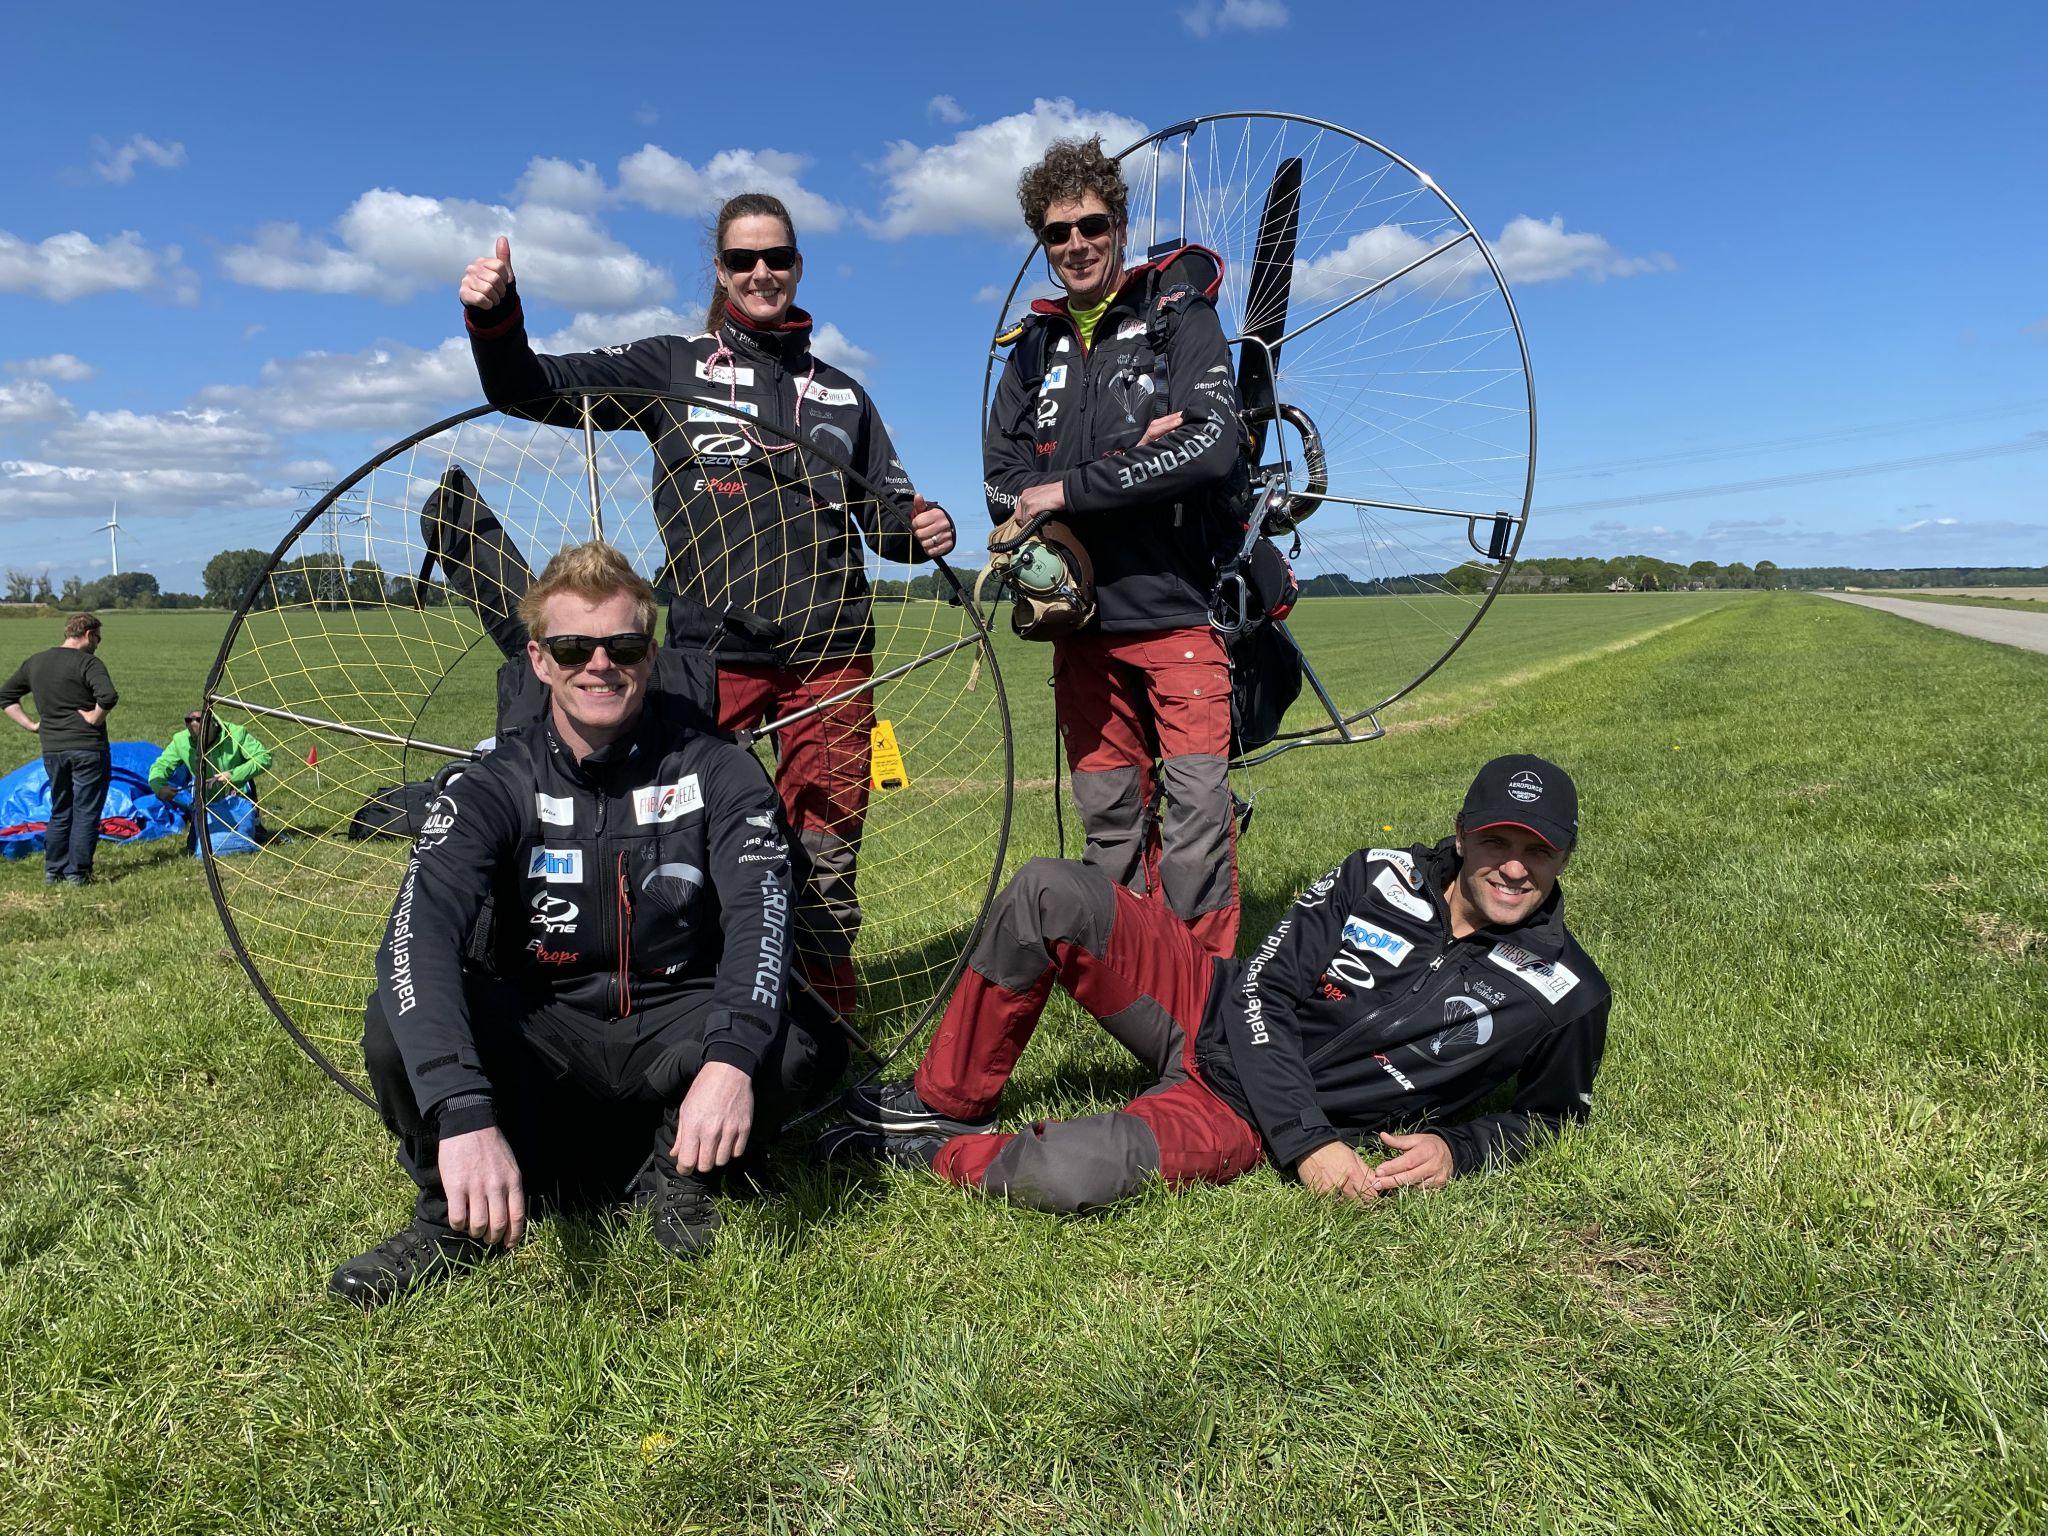 Team AeroForce